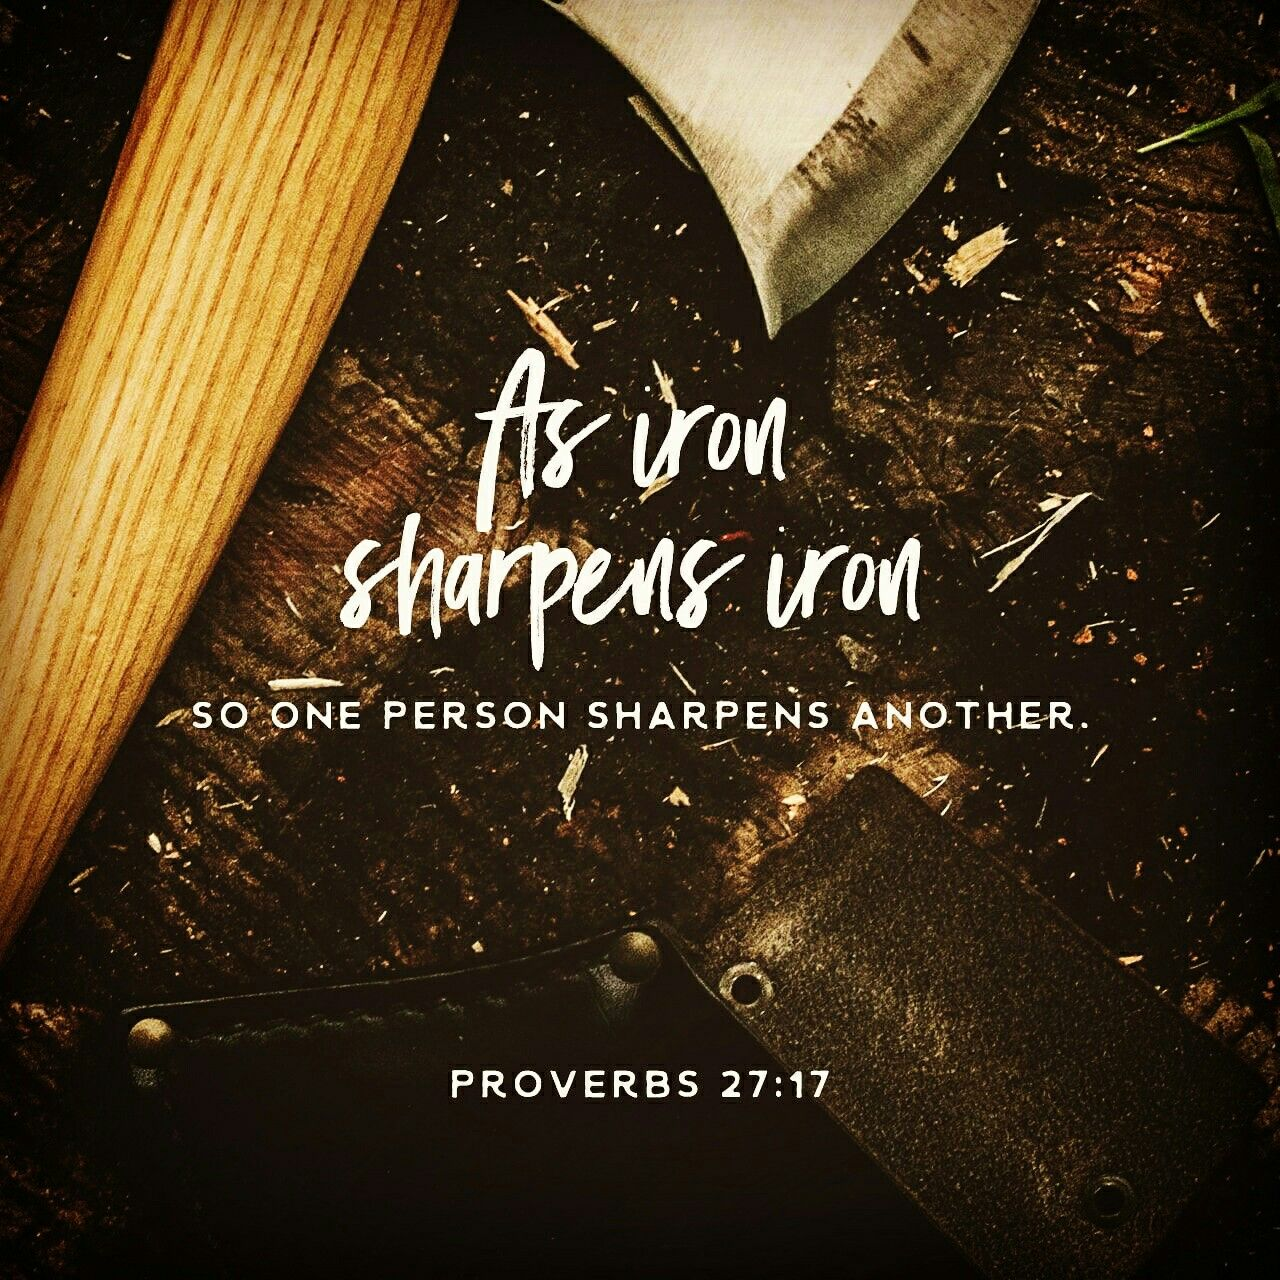 Proverbs 27:17 NIV - As iron sharpens iron, so one person ...